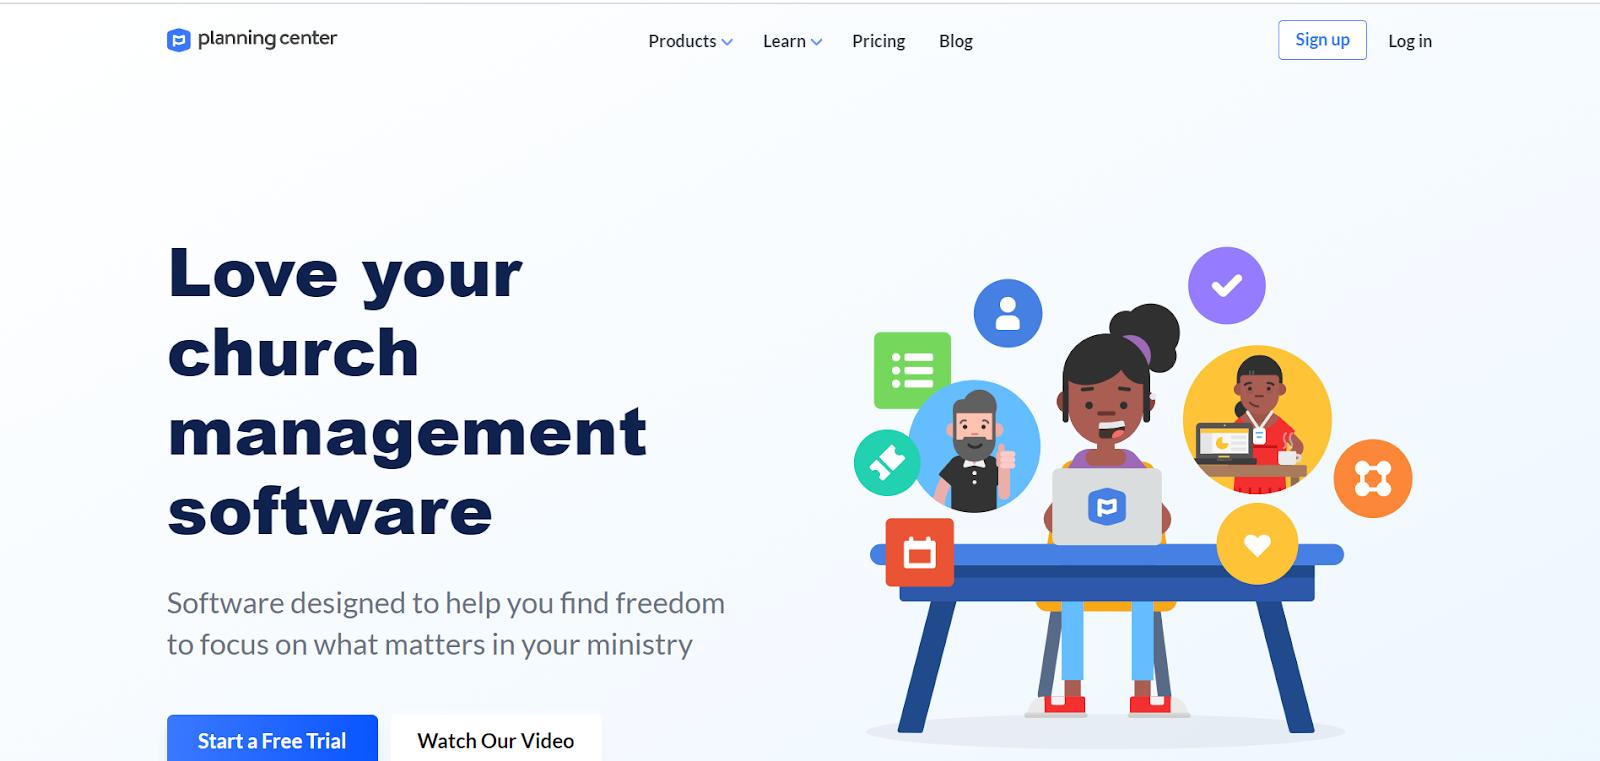 Login.planningcenteronline.com — Register & Use the Portal